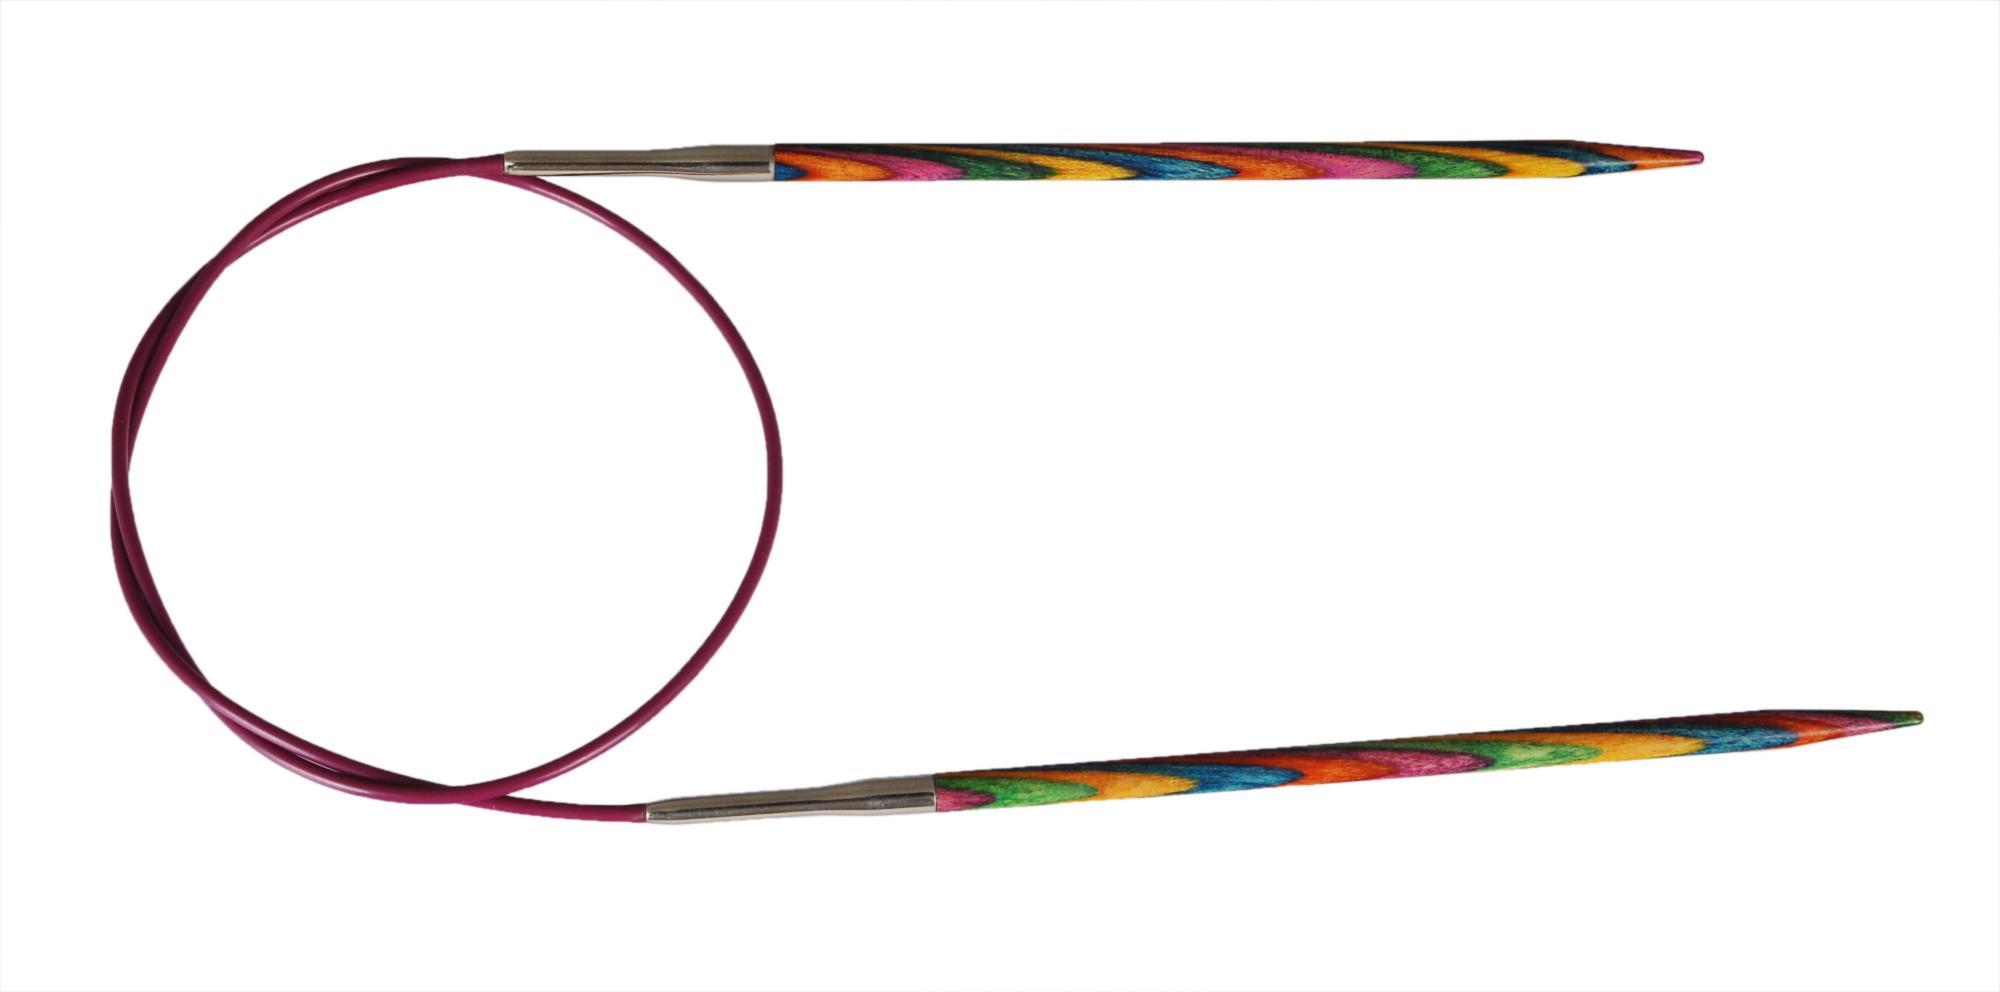 Спицы круговые 120 см Symfonie Wood KnitPro, 21368, 4.50 мм